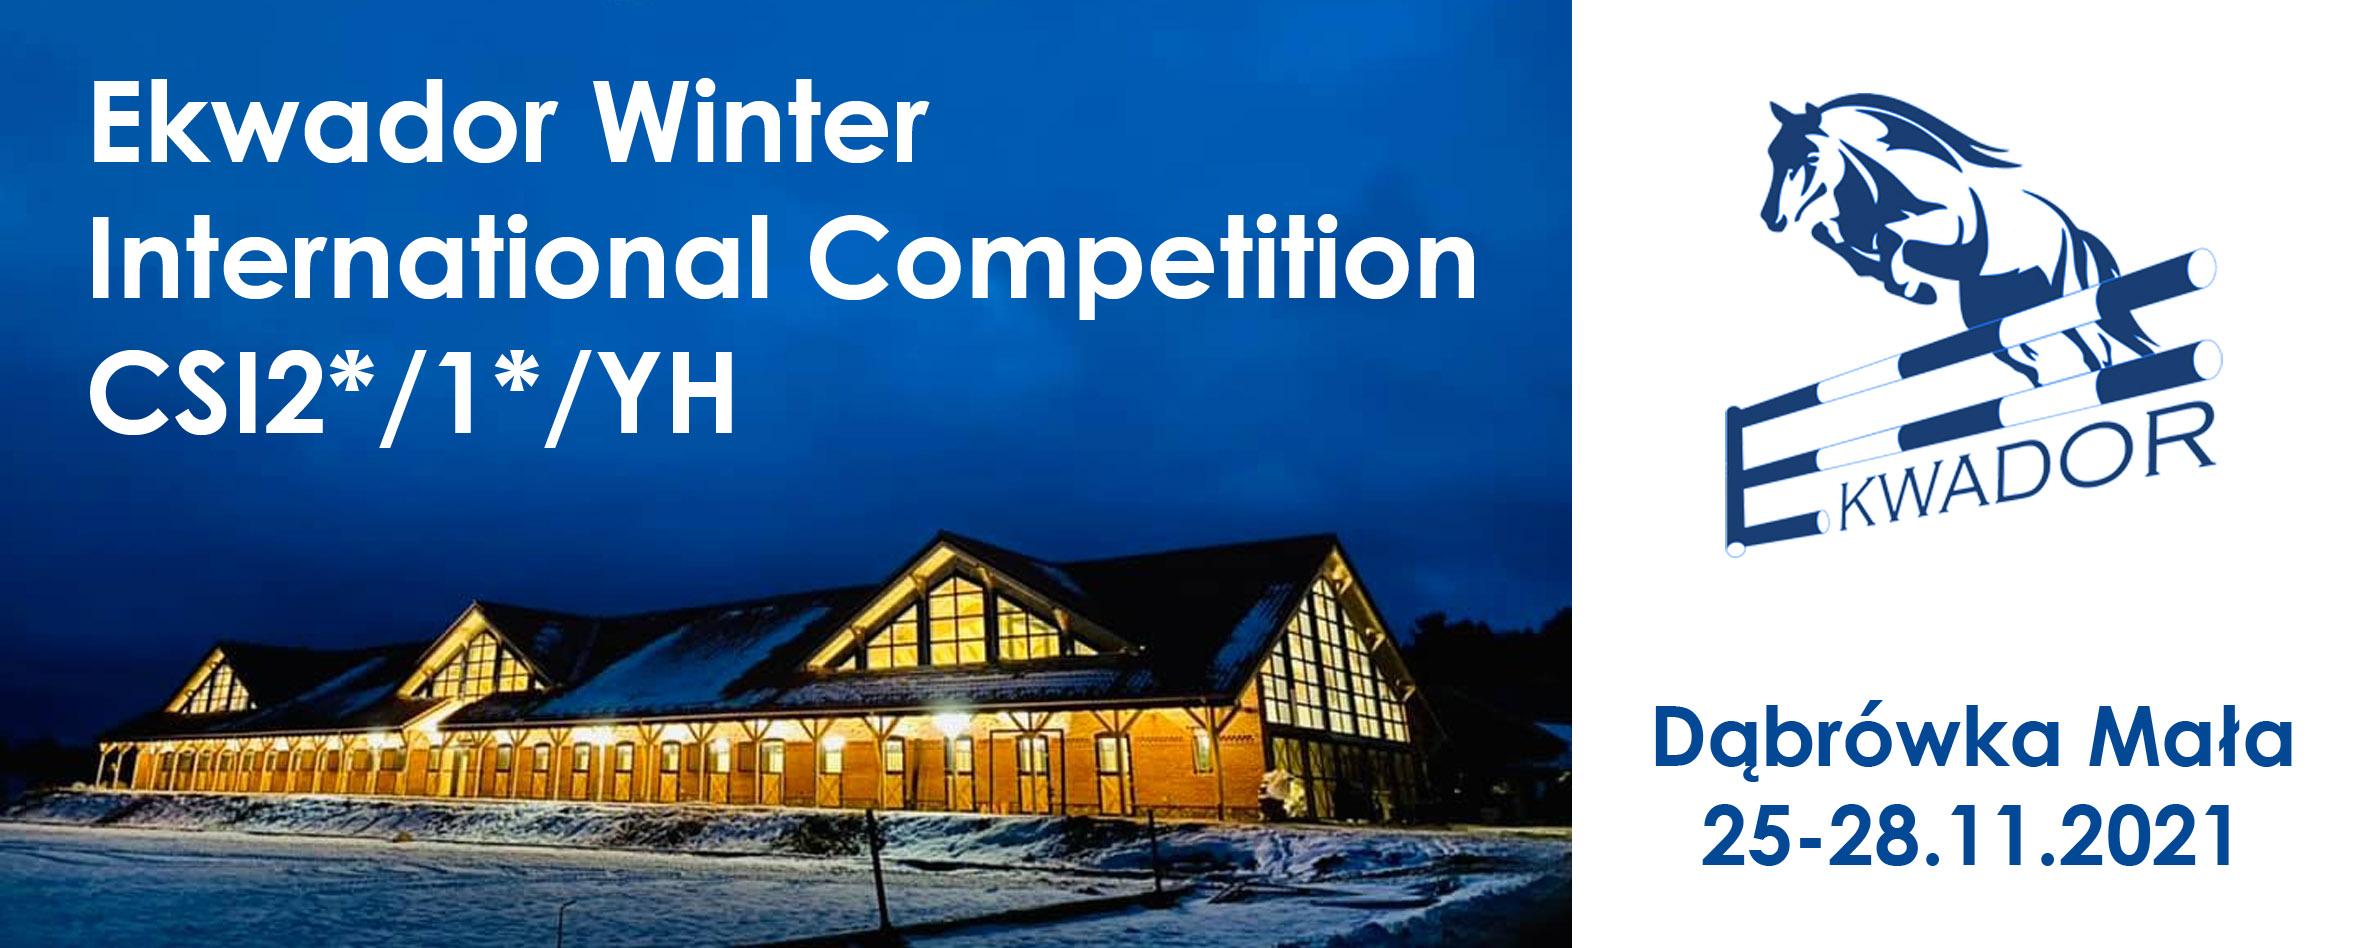 Ekwador Winter International Competition Dąbrówka Mała CSI2*/1*/YH